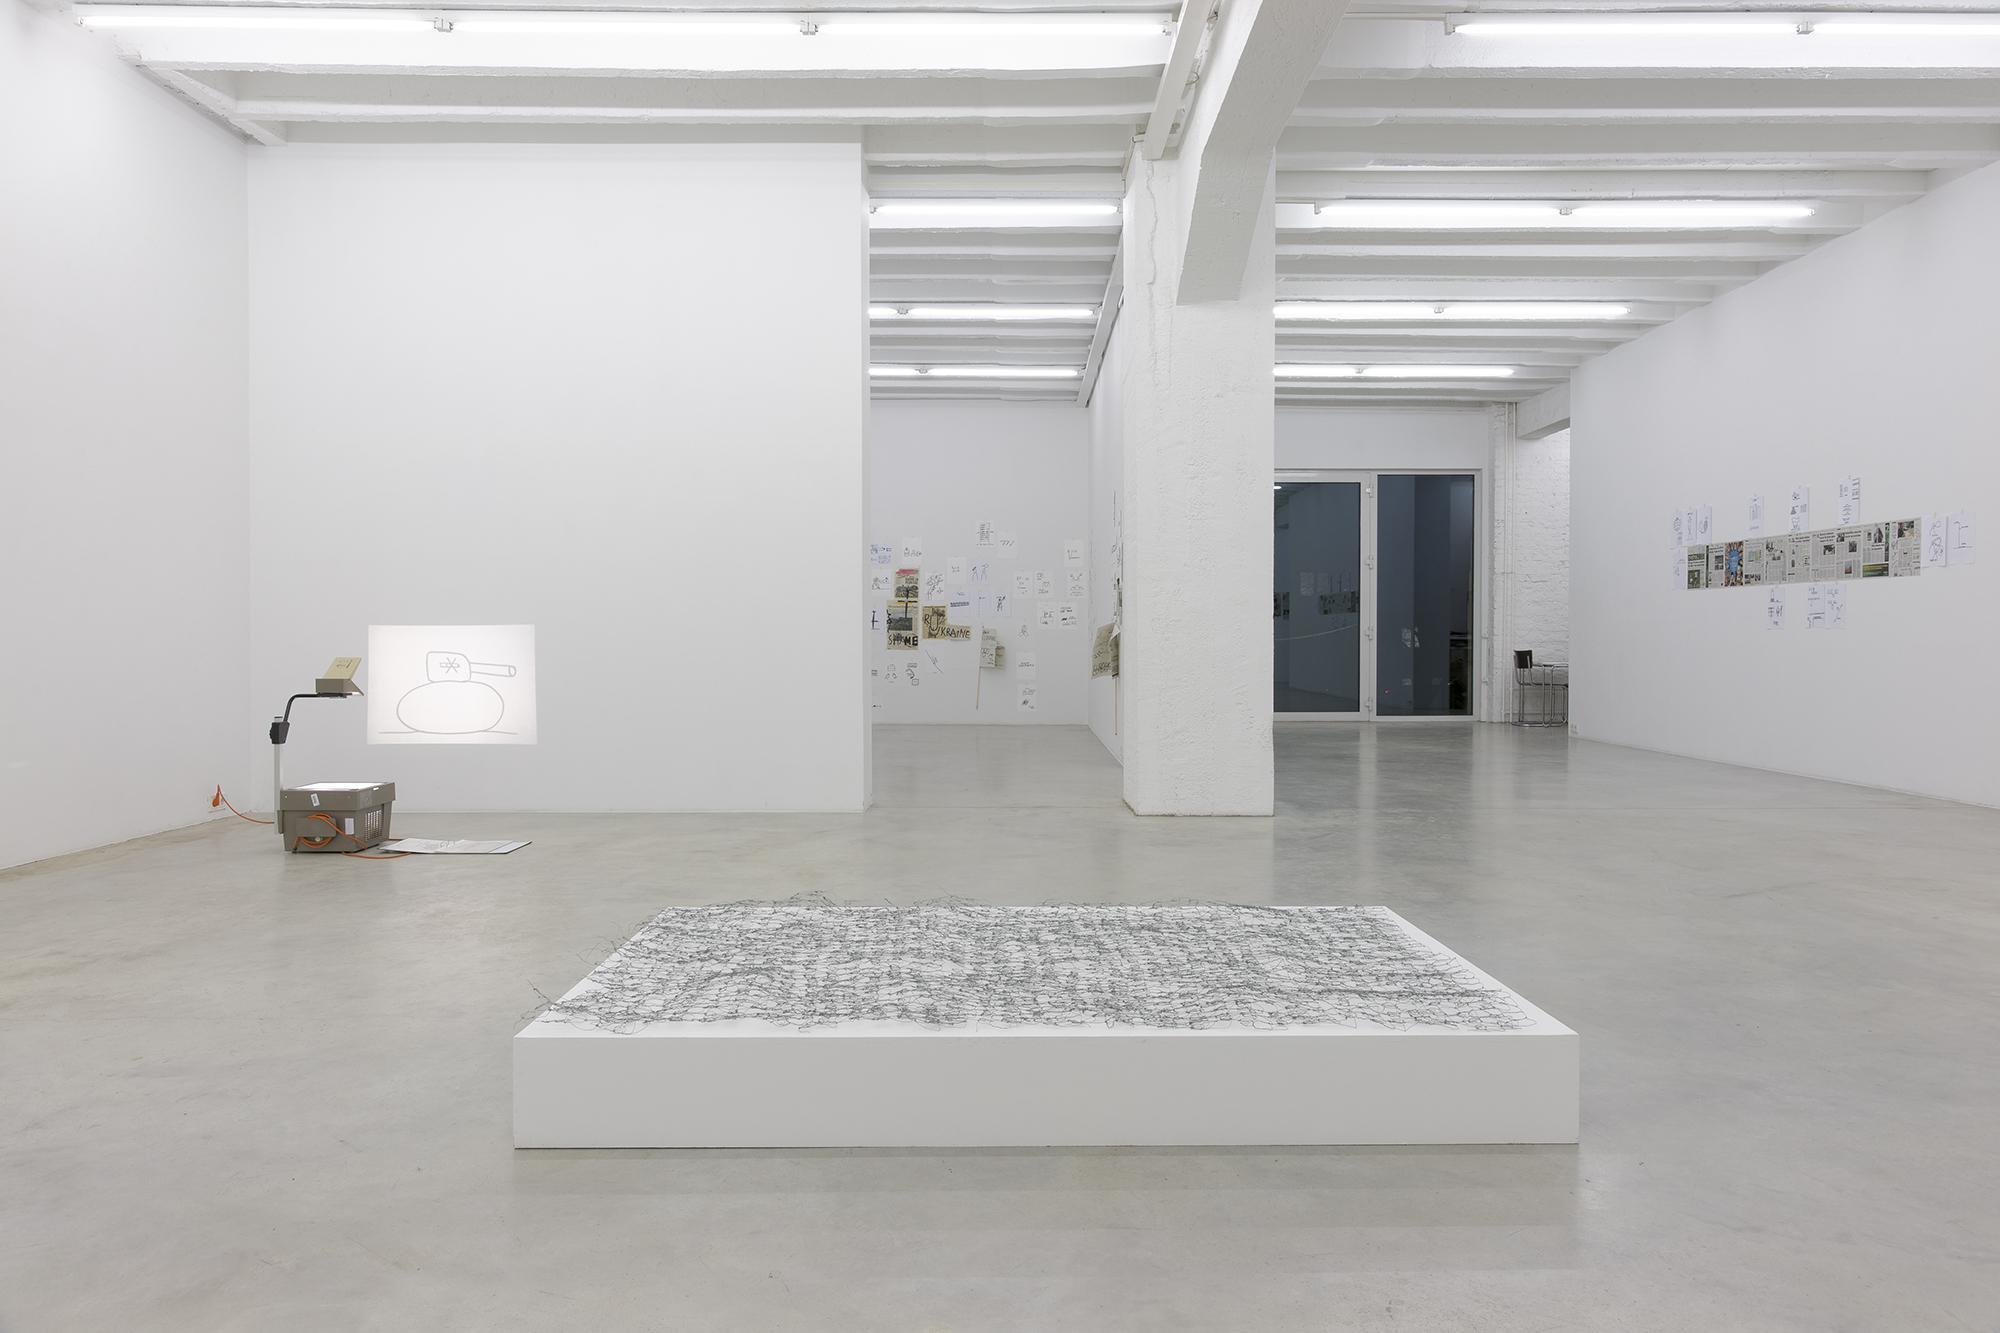 Dan Perjovschi: Need to Draw, exhibition view, Galerija Gregor Podnar, Berlin, 2014. Photo: Marcus Schneider